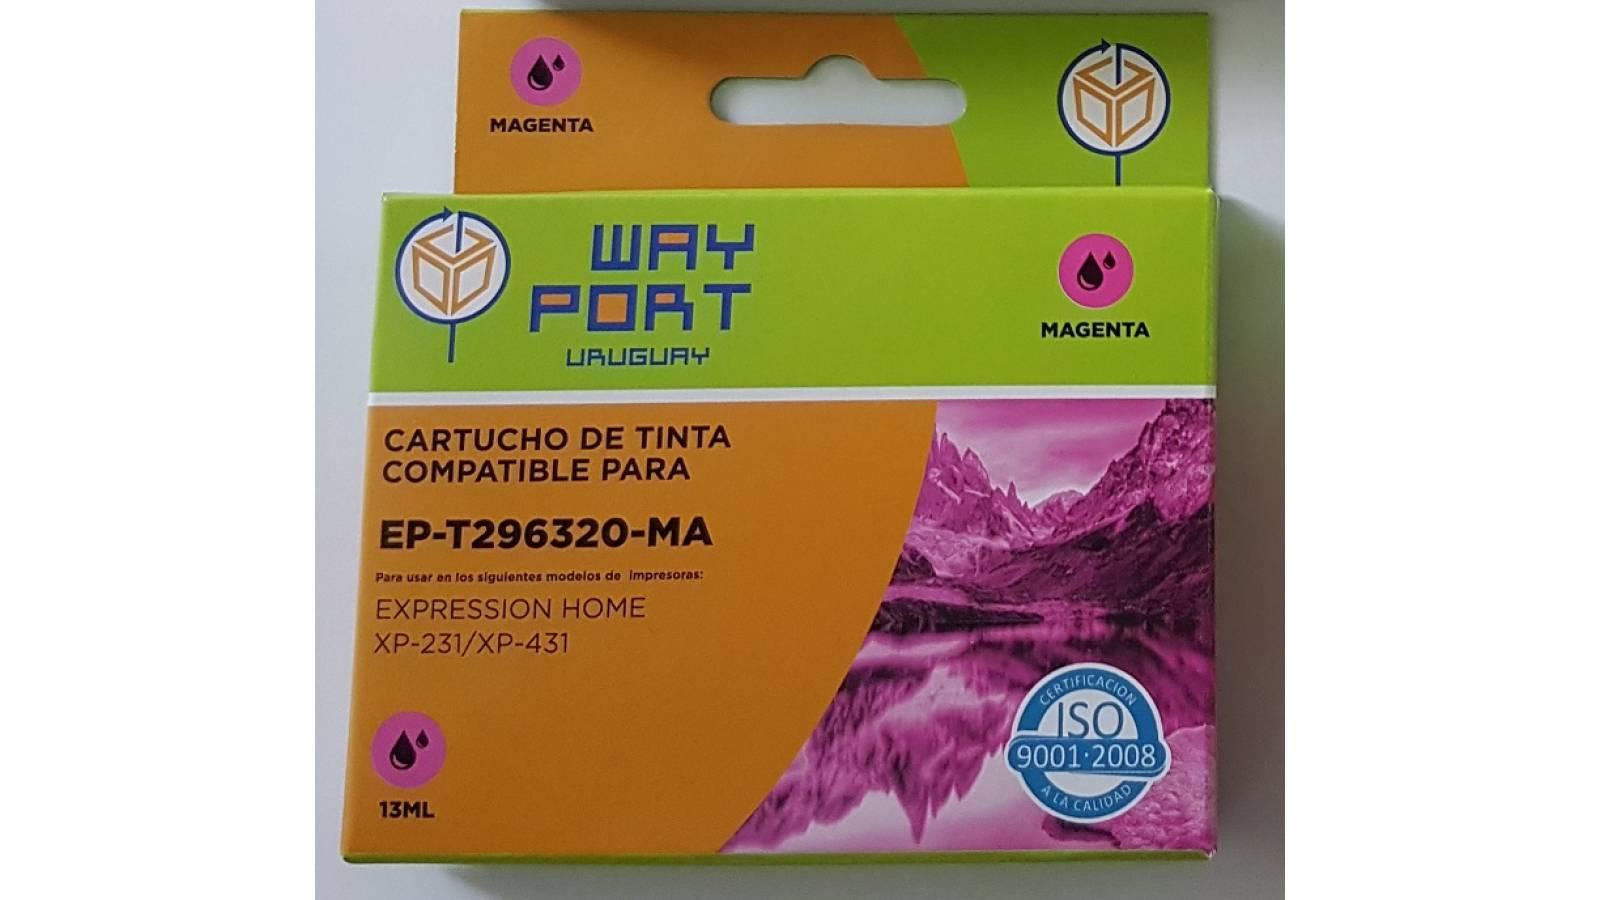 CARTUCHO COMPATIBLE WP PARA EPSON  XP231 / XP431 13ML - MAGENTA